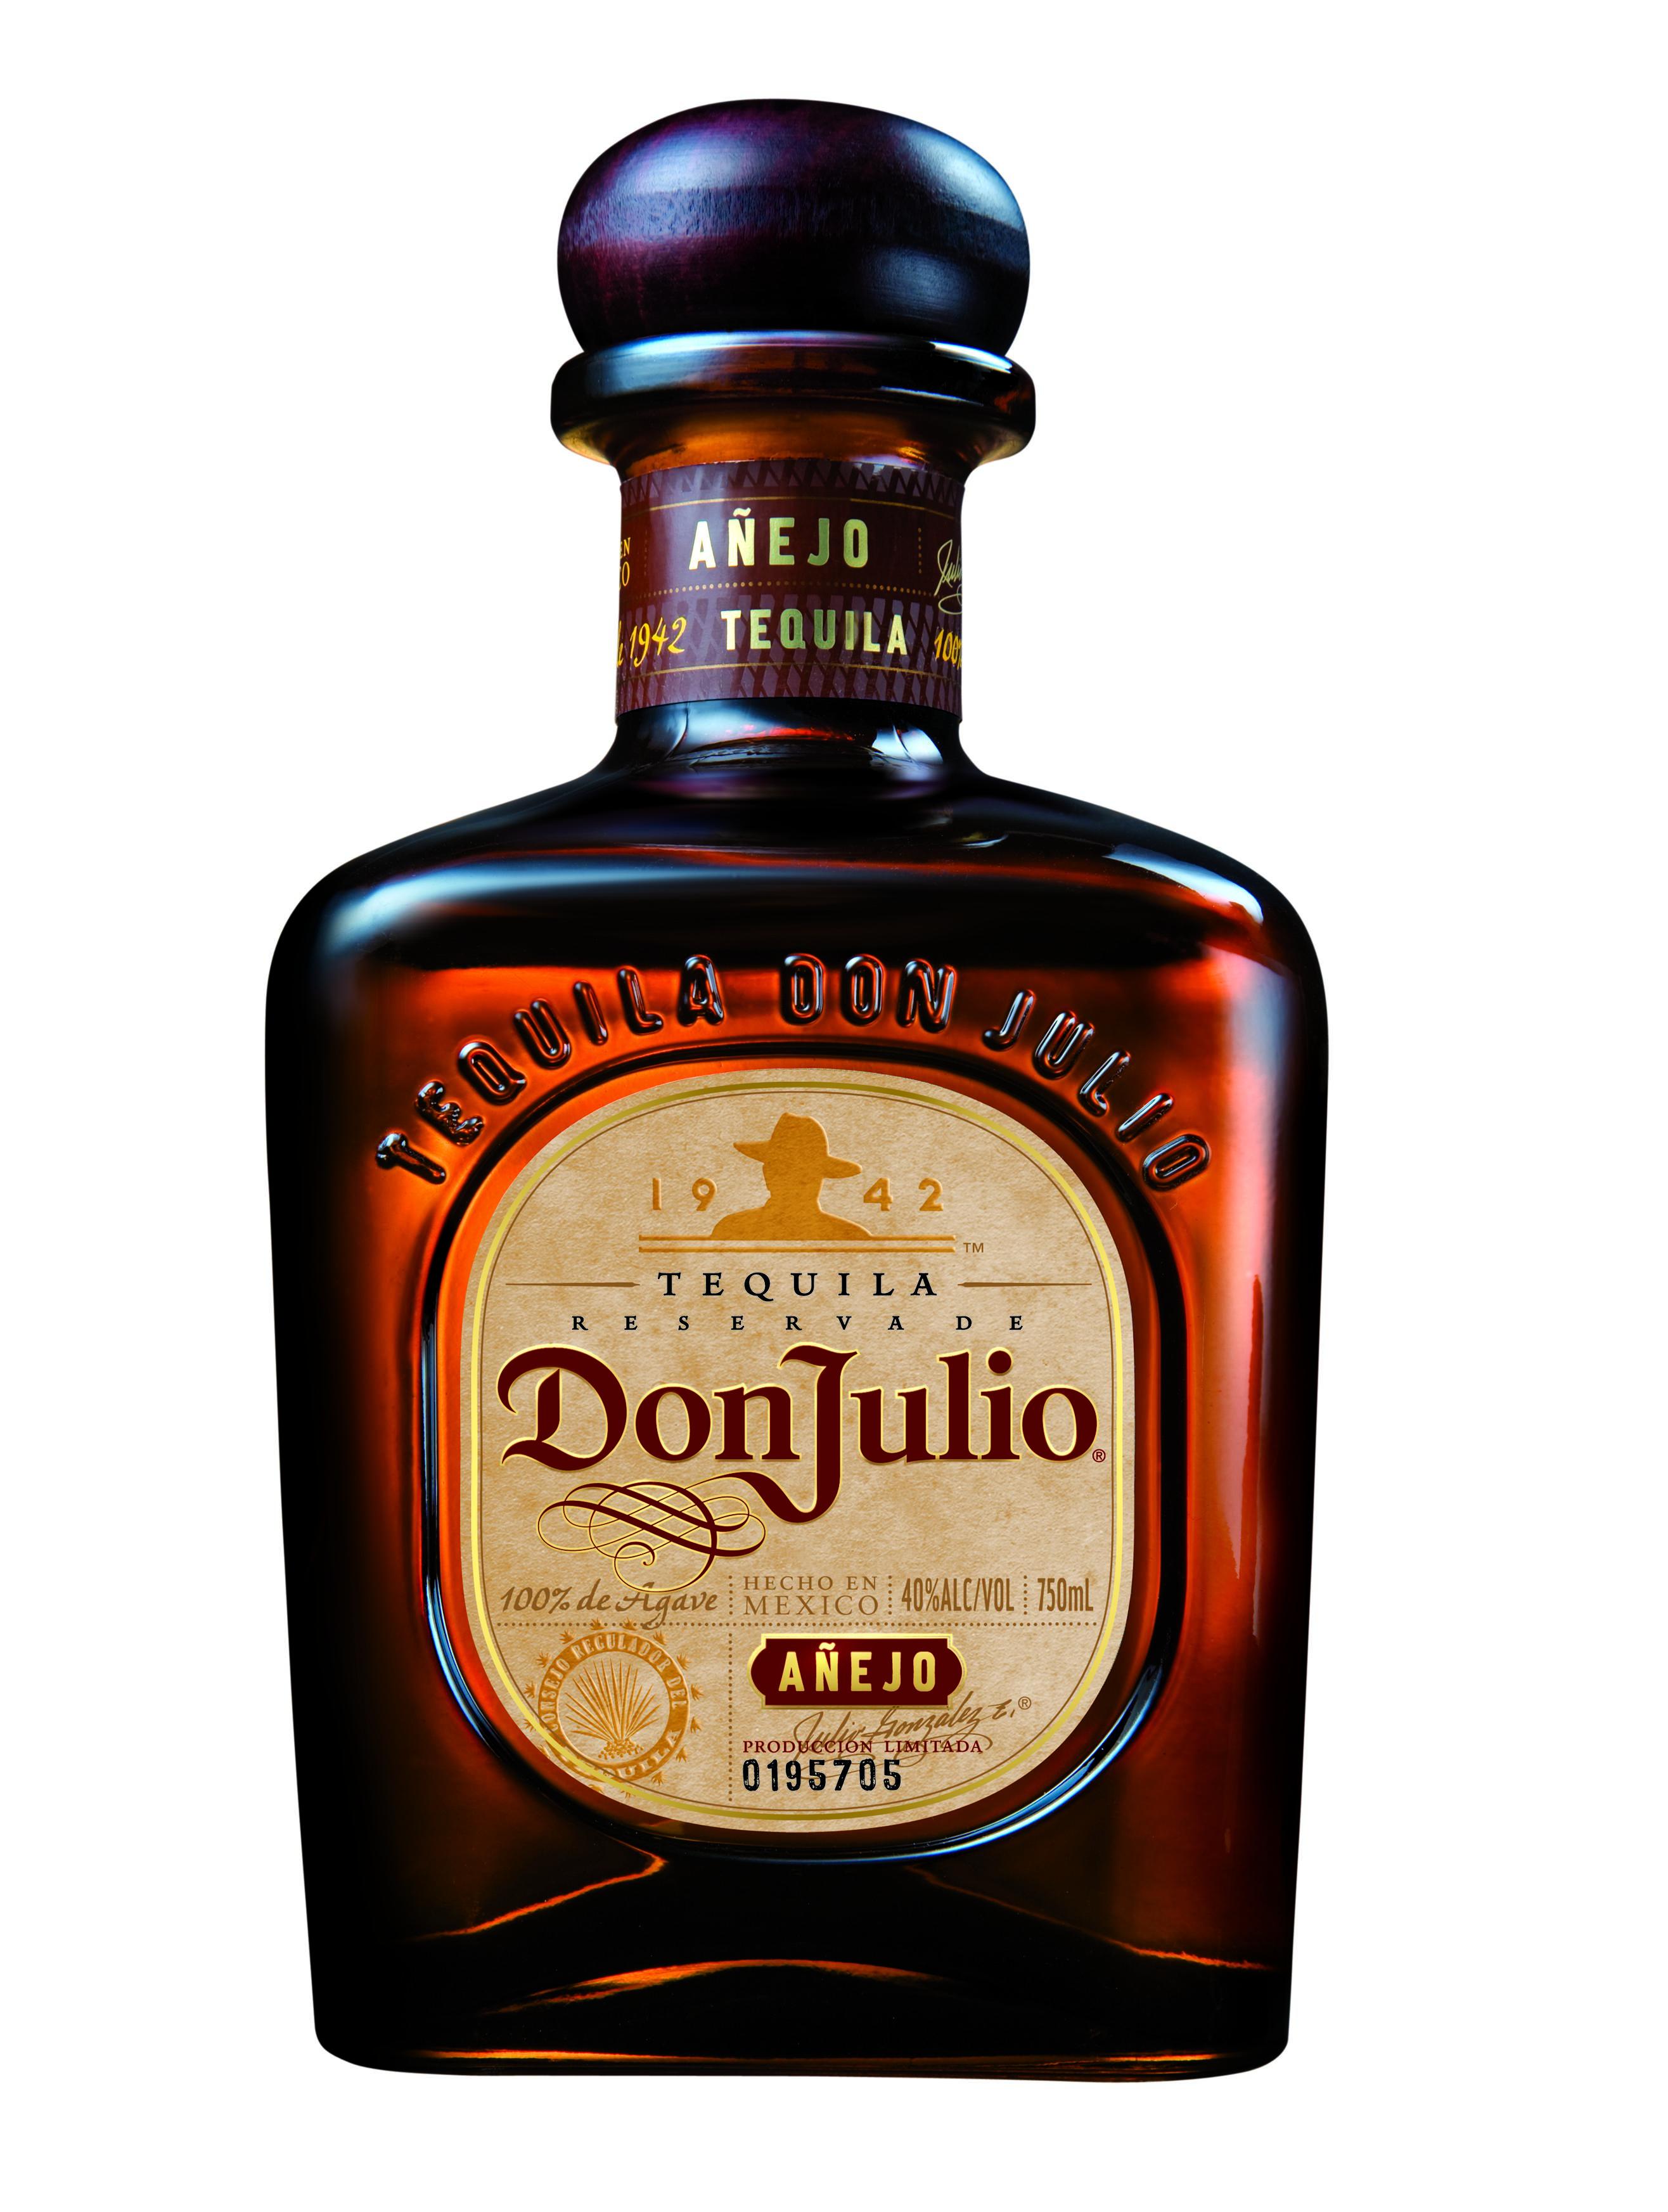 Diageo Swaps Bushmills for Control of Don Julio Brand